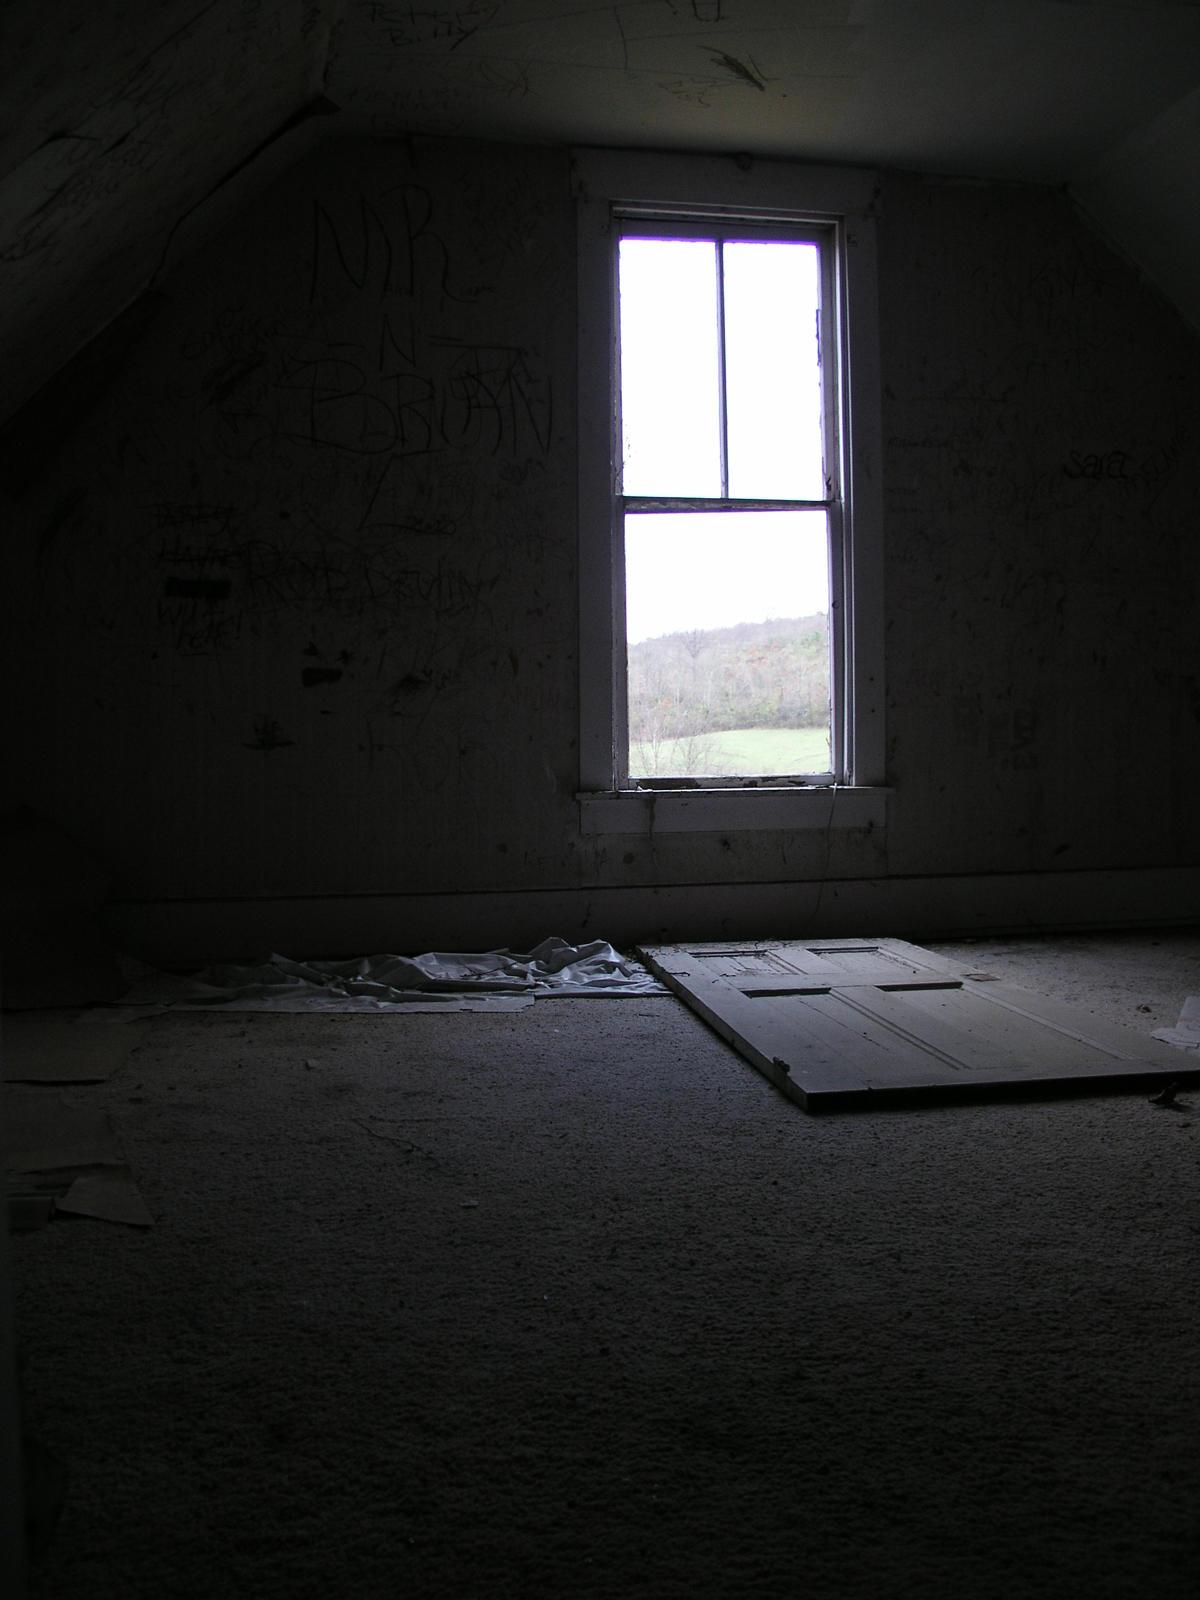 s s dark room 1 by shudder stock on deviantart